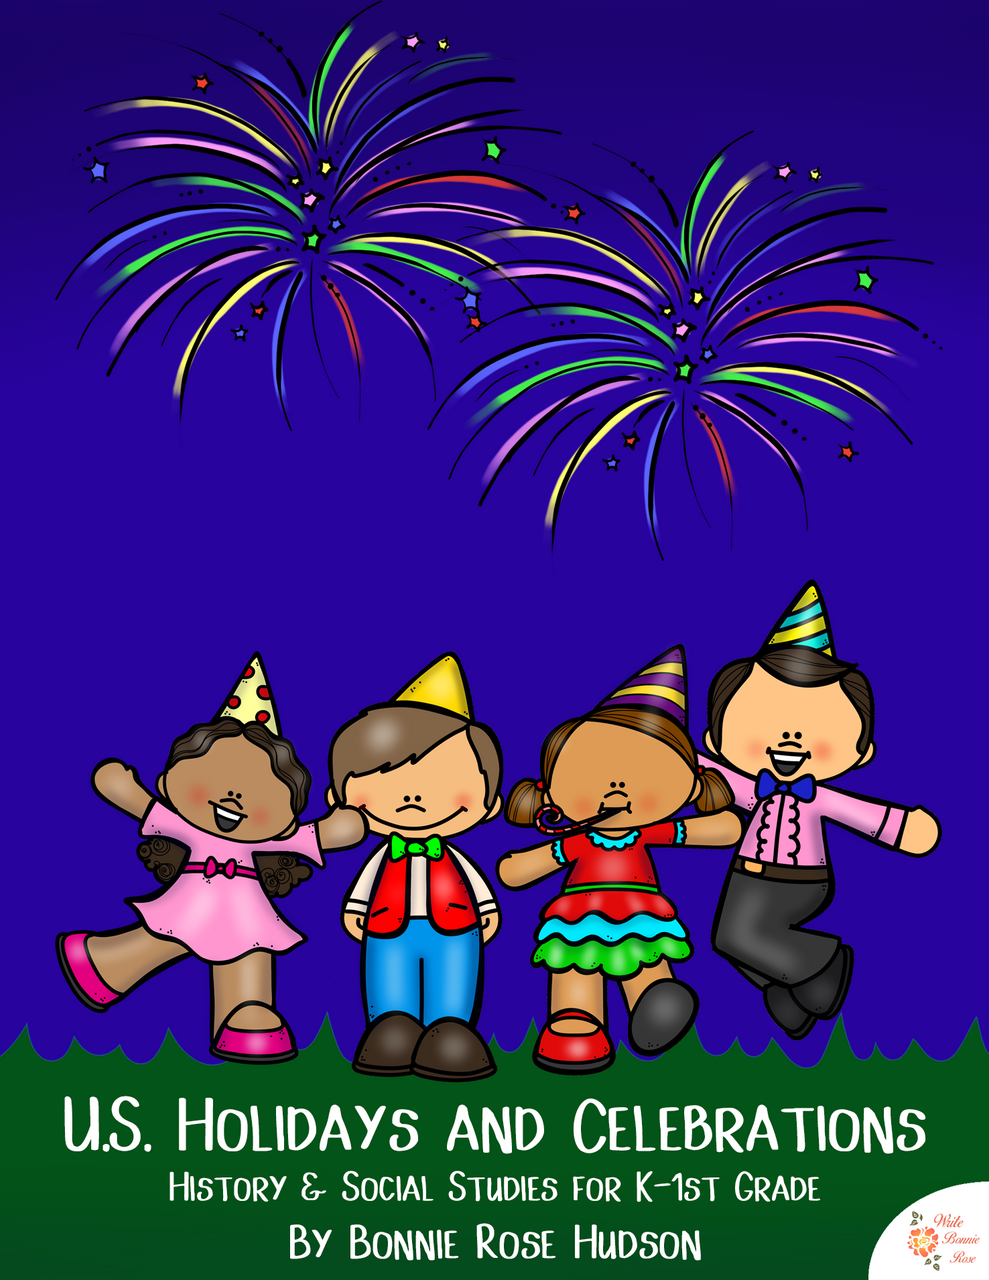 U.S. Holidays and Celebrations